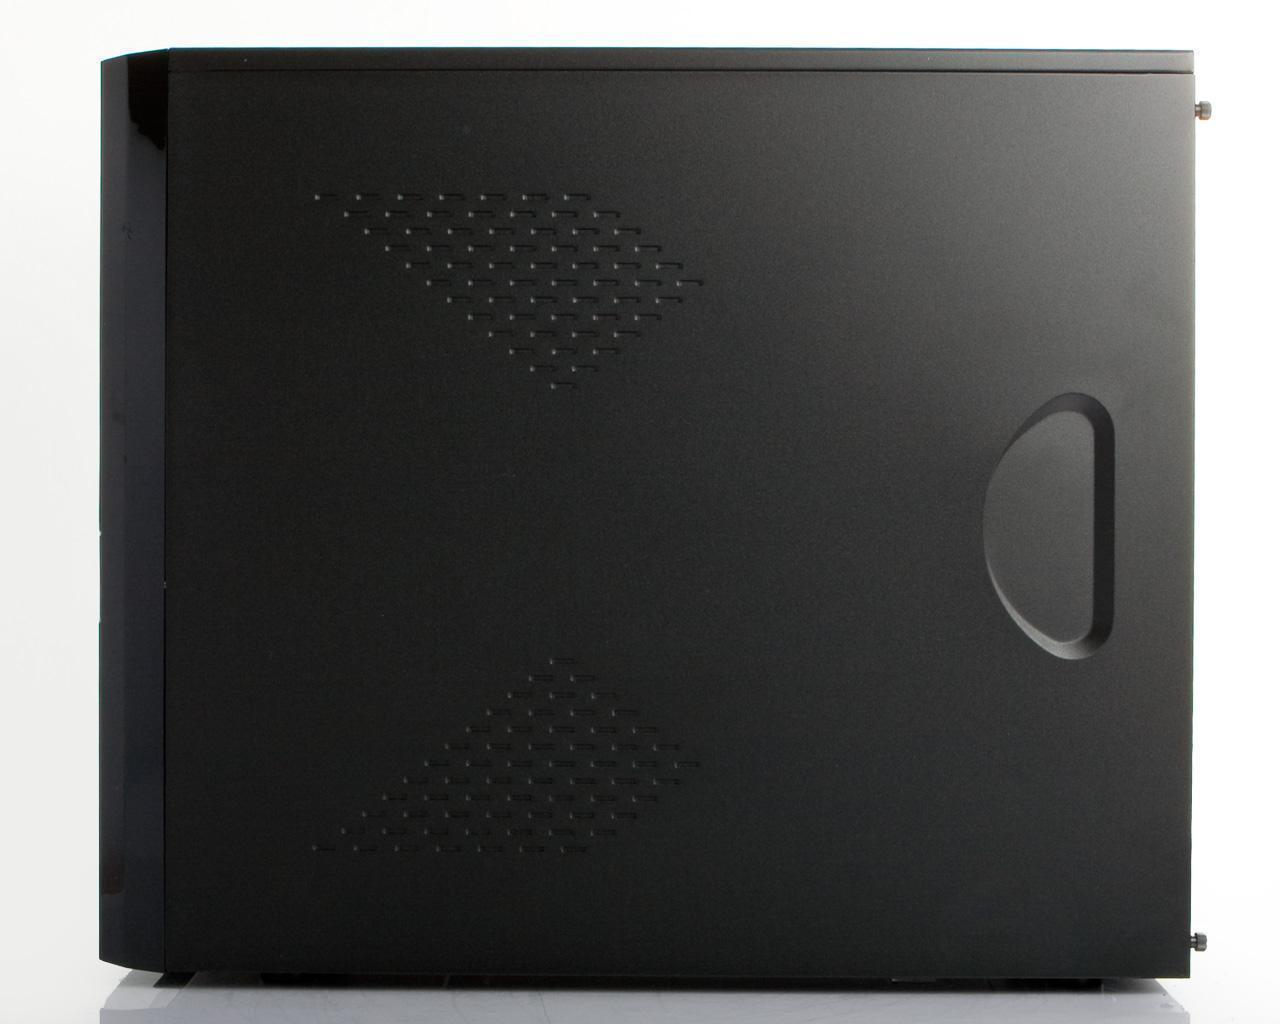 http://images.novatech.co.uk/ev-bb-8304x32.jpg